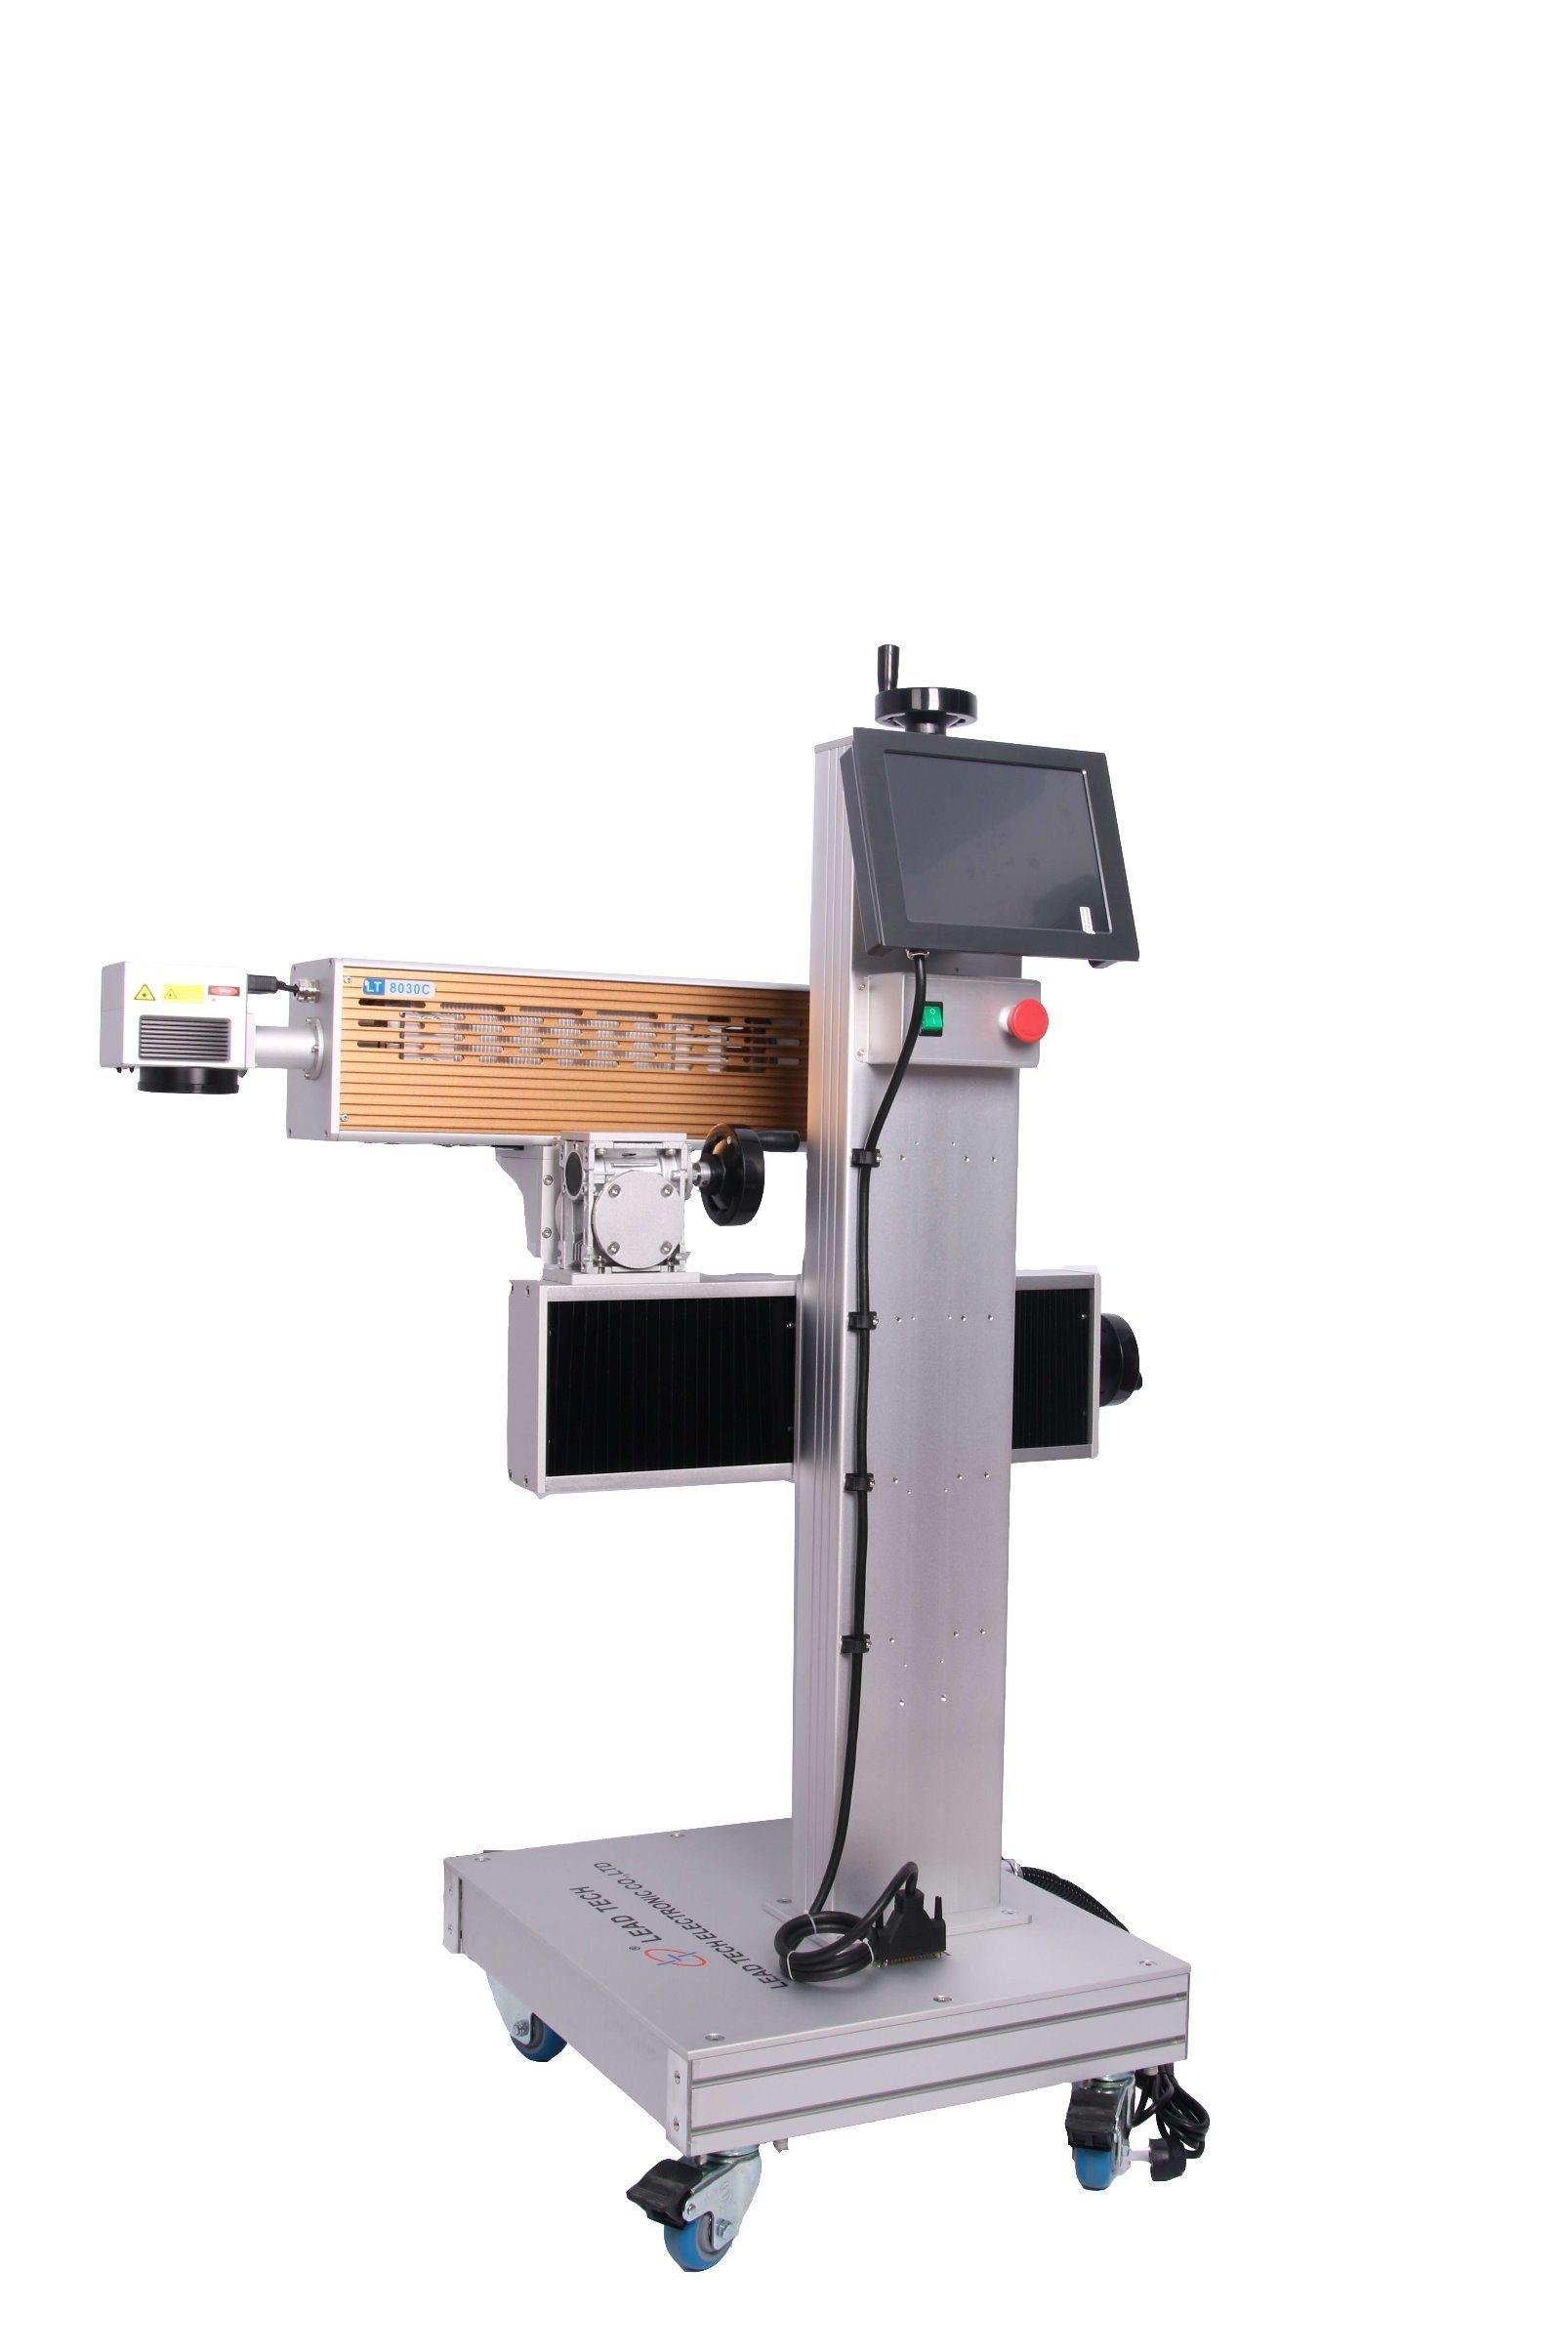 Lt8020c/Lt8030c CO2 Stainless Steel Digital Laser Printer